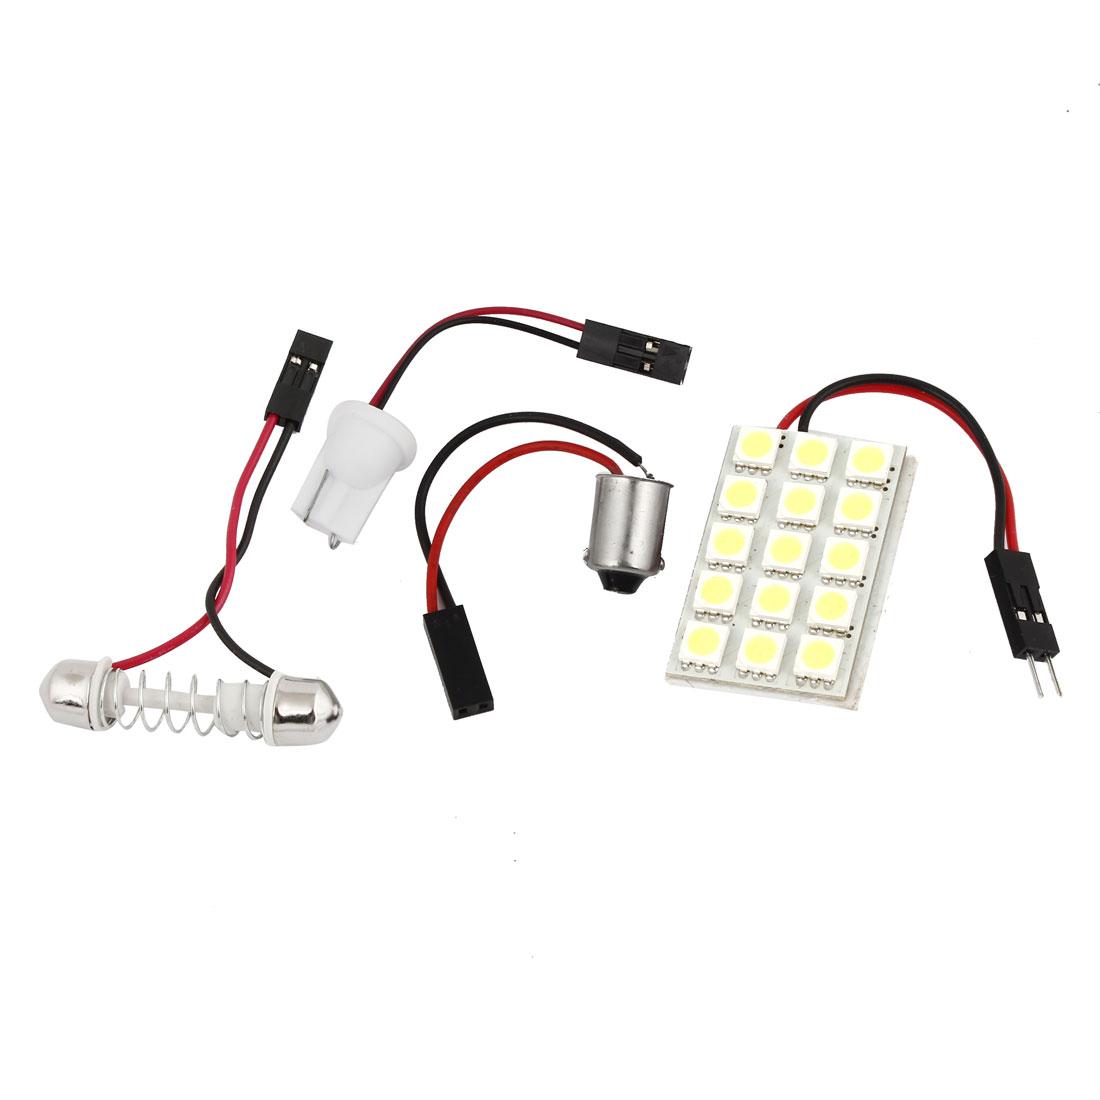 Auto 15 White 5050 SMD LED Reading Light w T10 BA9S Festoon Adapter Internal